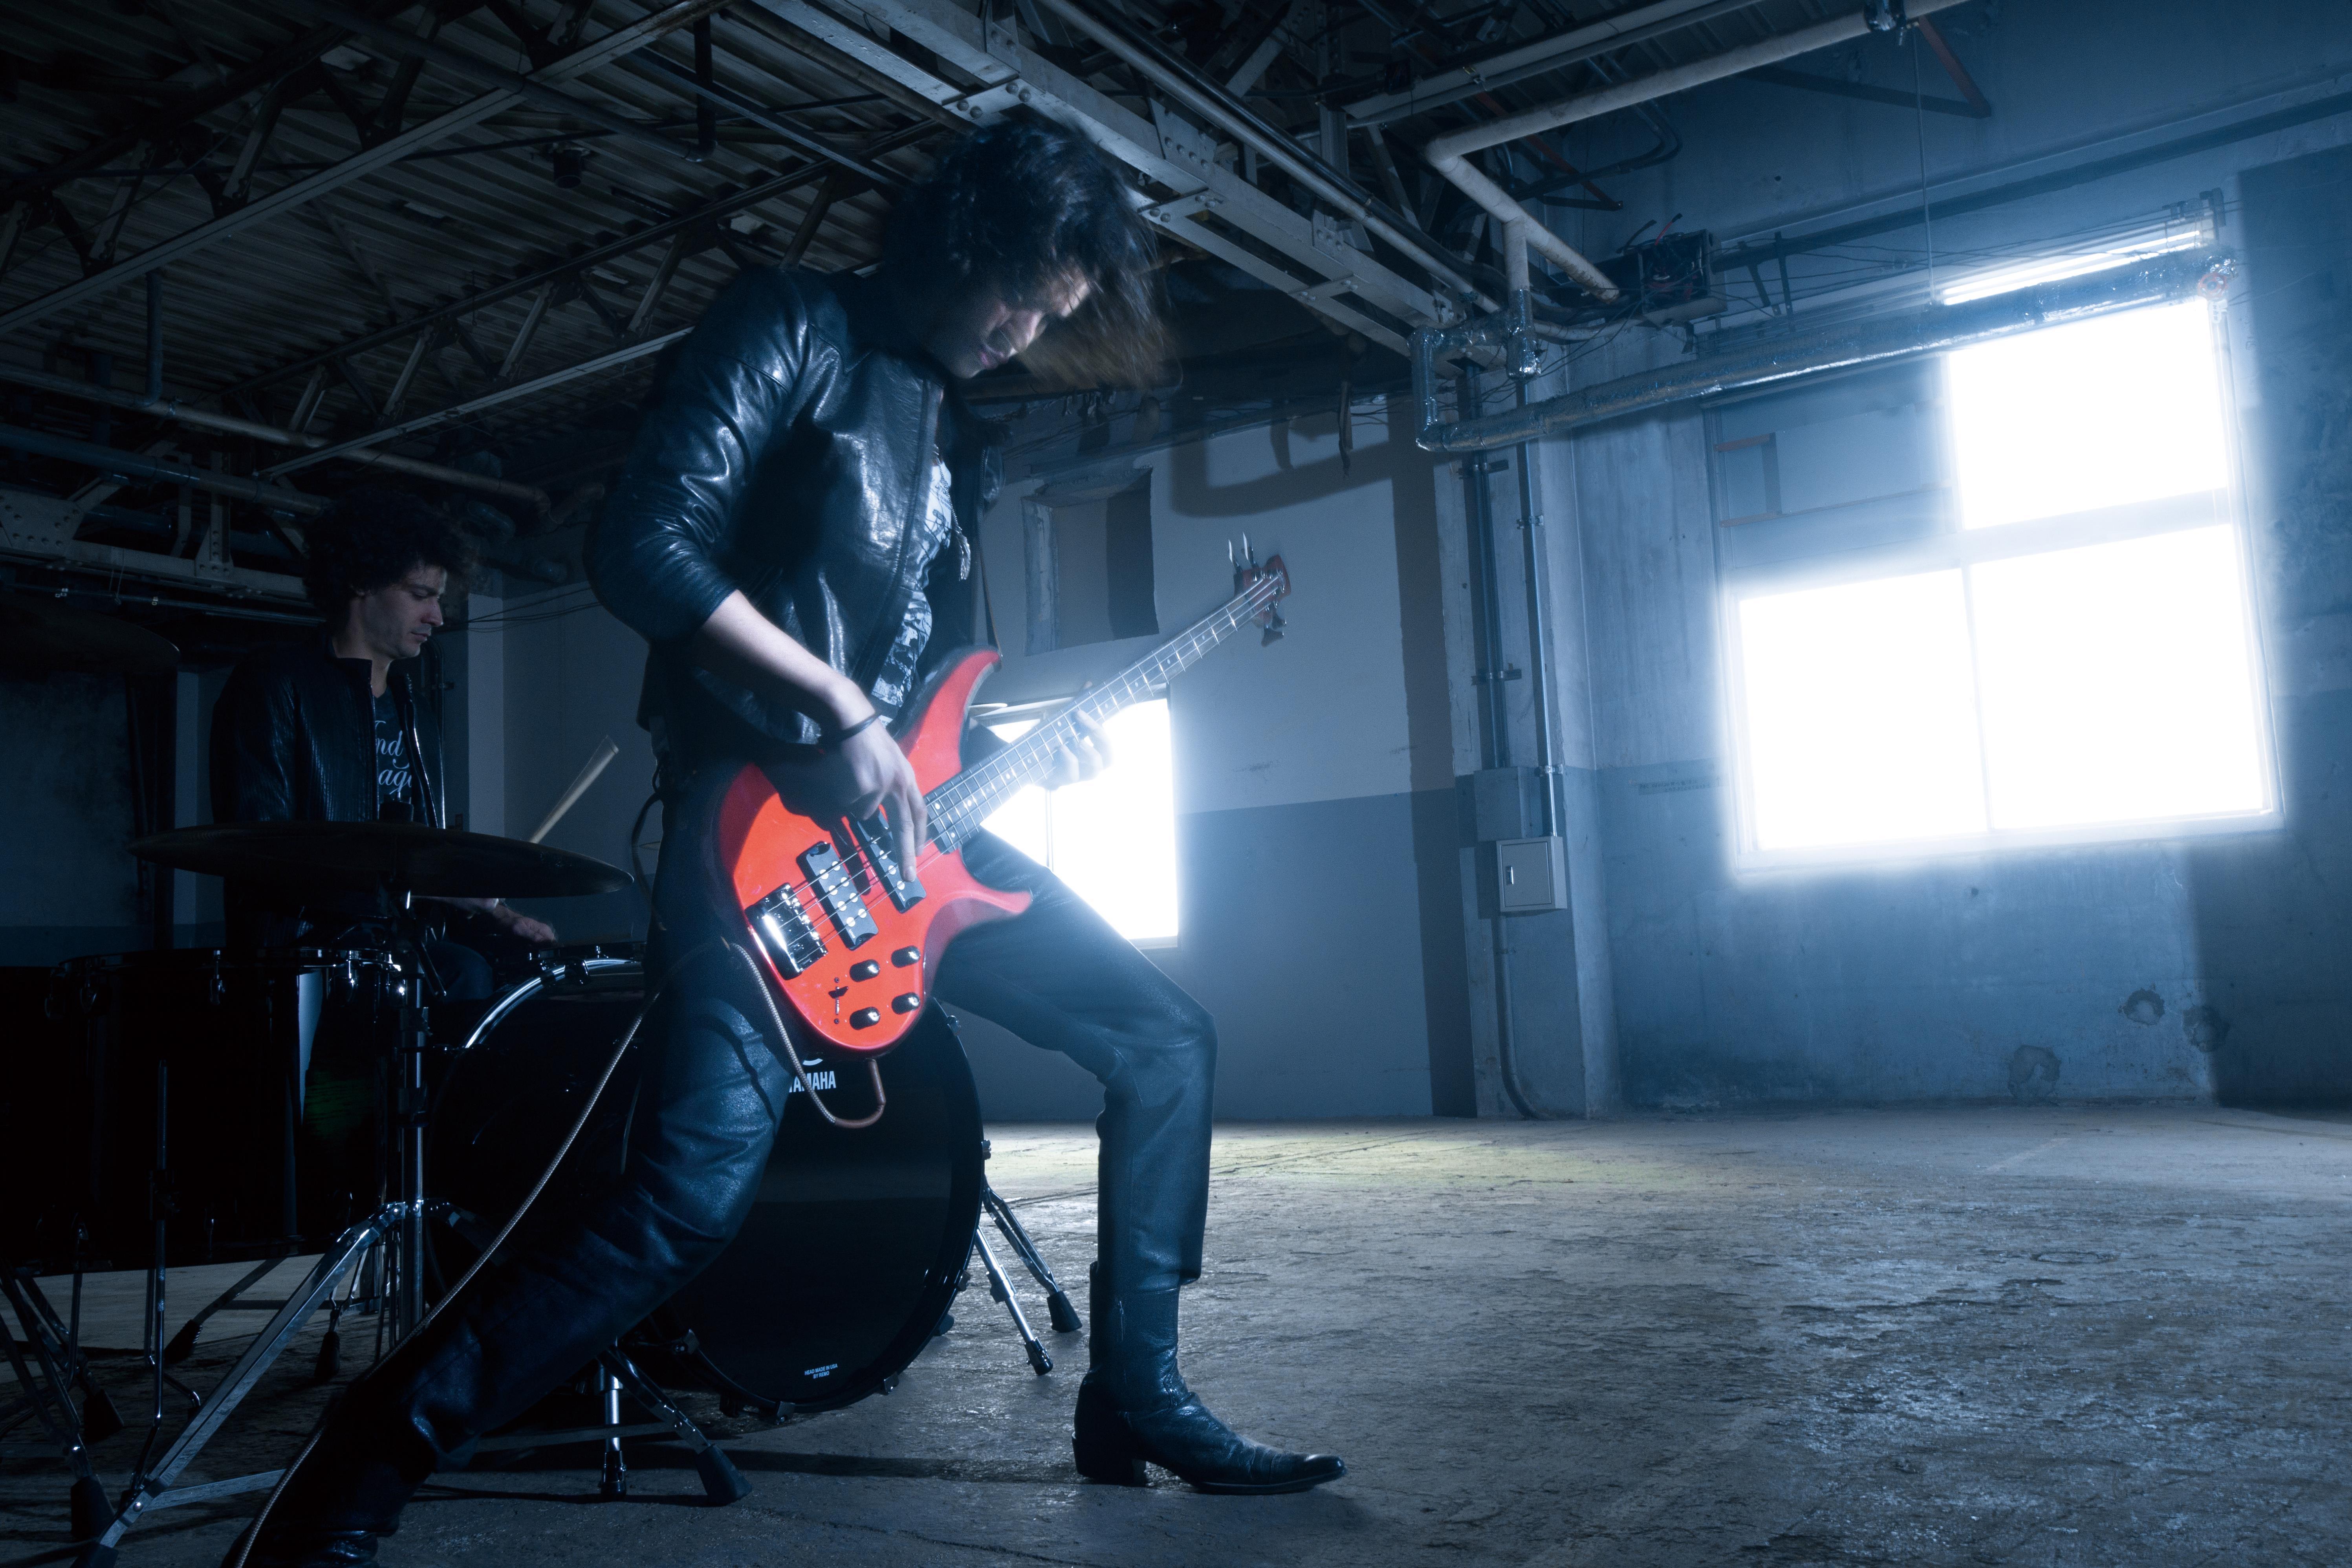 yamaha trbx305 pwt 5 string electric bass guitar